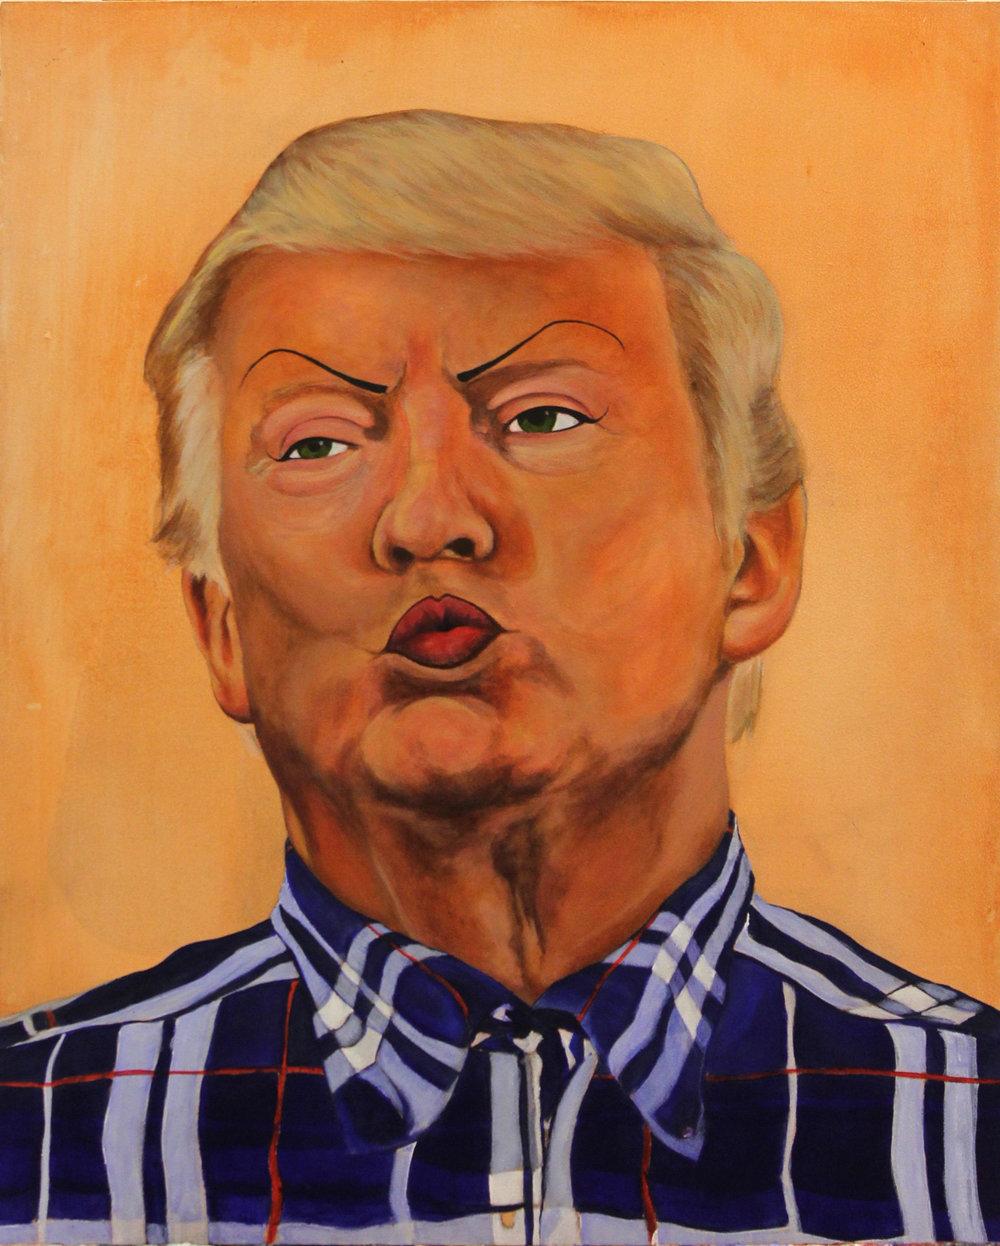 Chola Trump